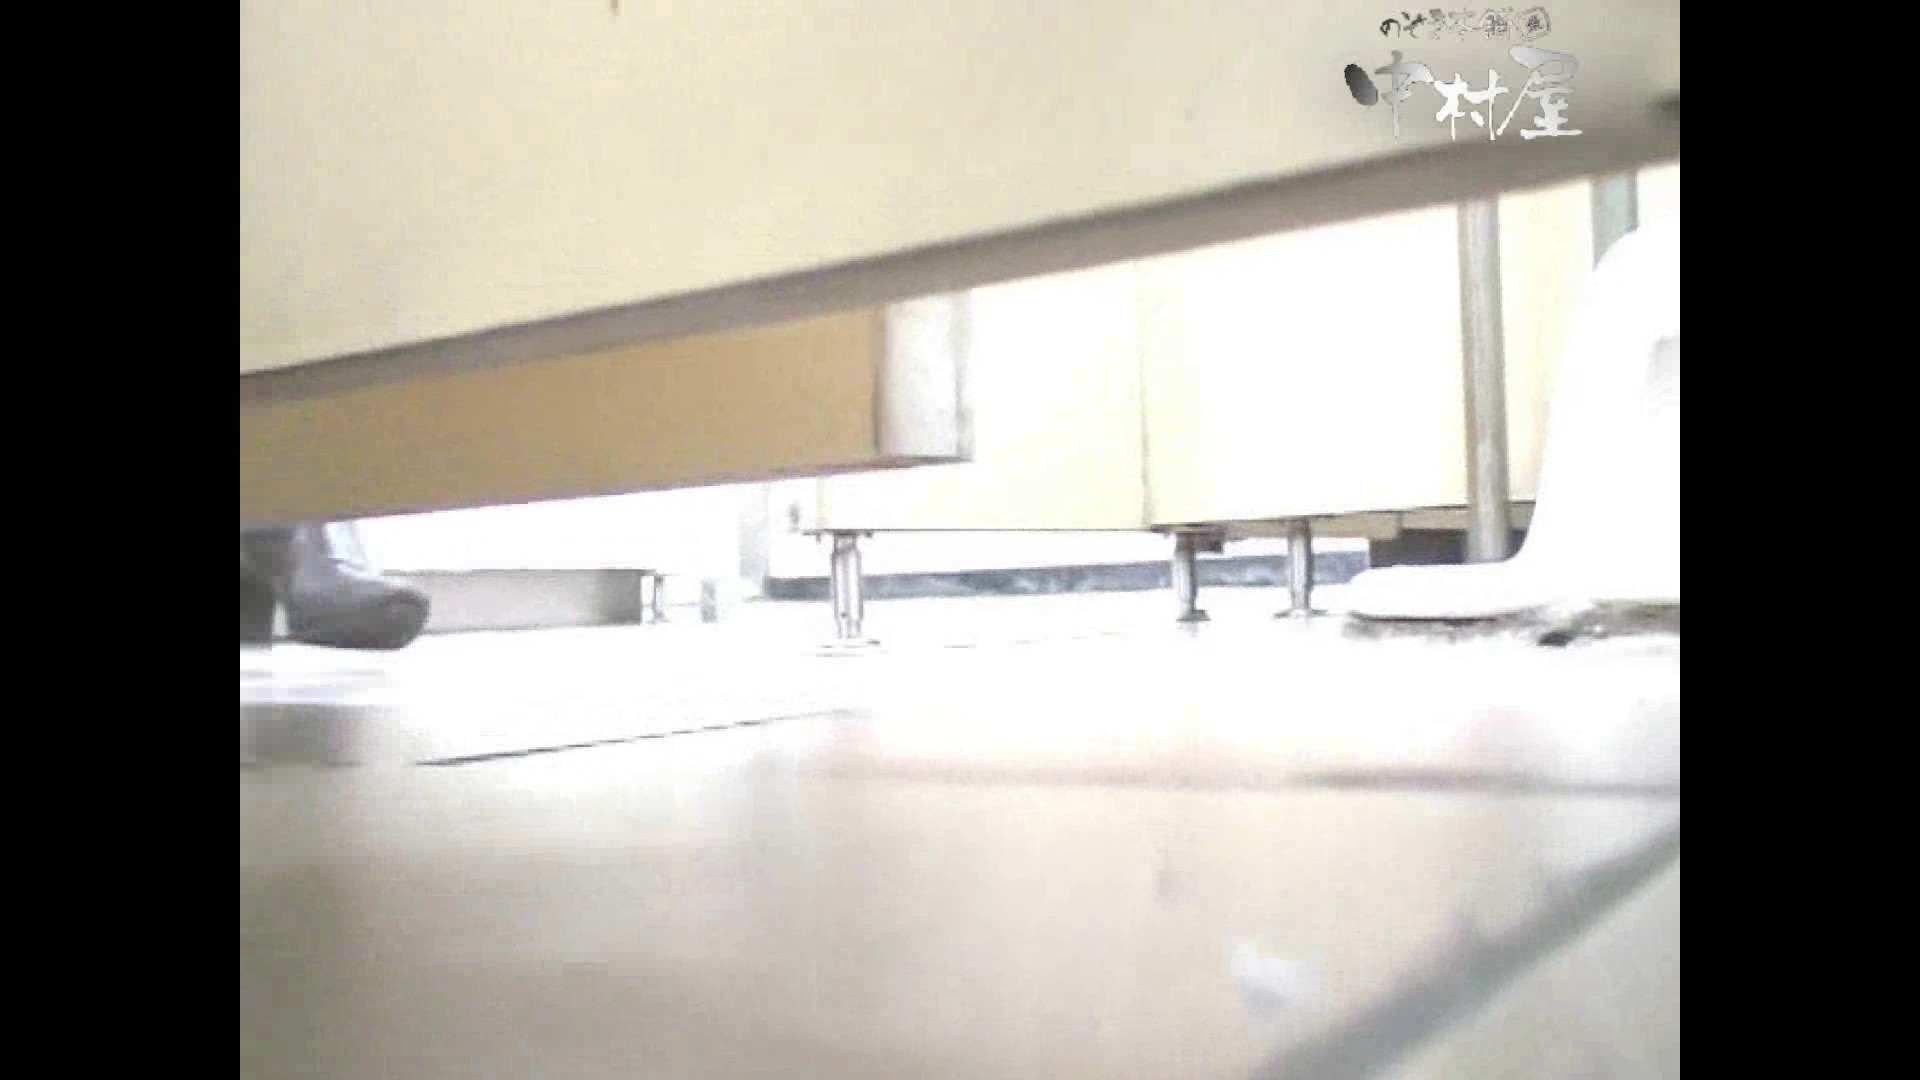 岩手県在住盗撮師盗撮記録vol.38 盗撮 AV動画キャプチャ 84枚 13